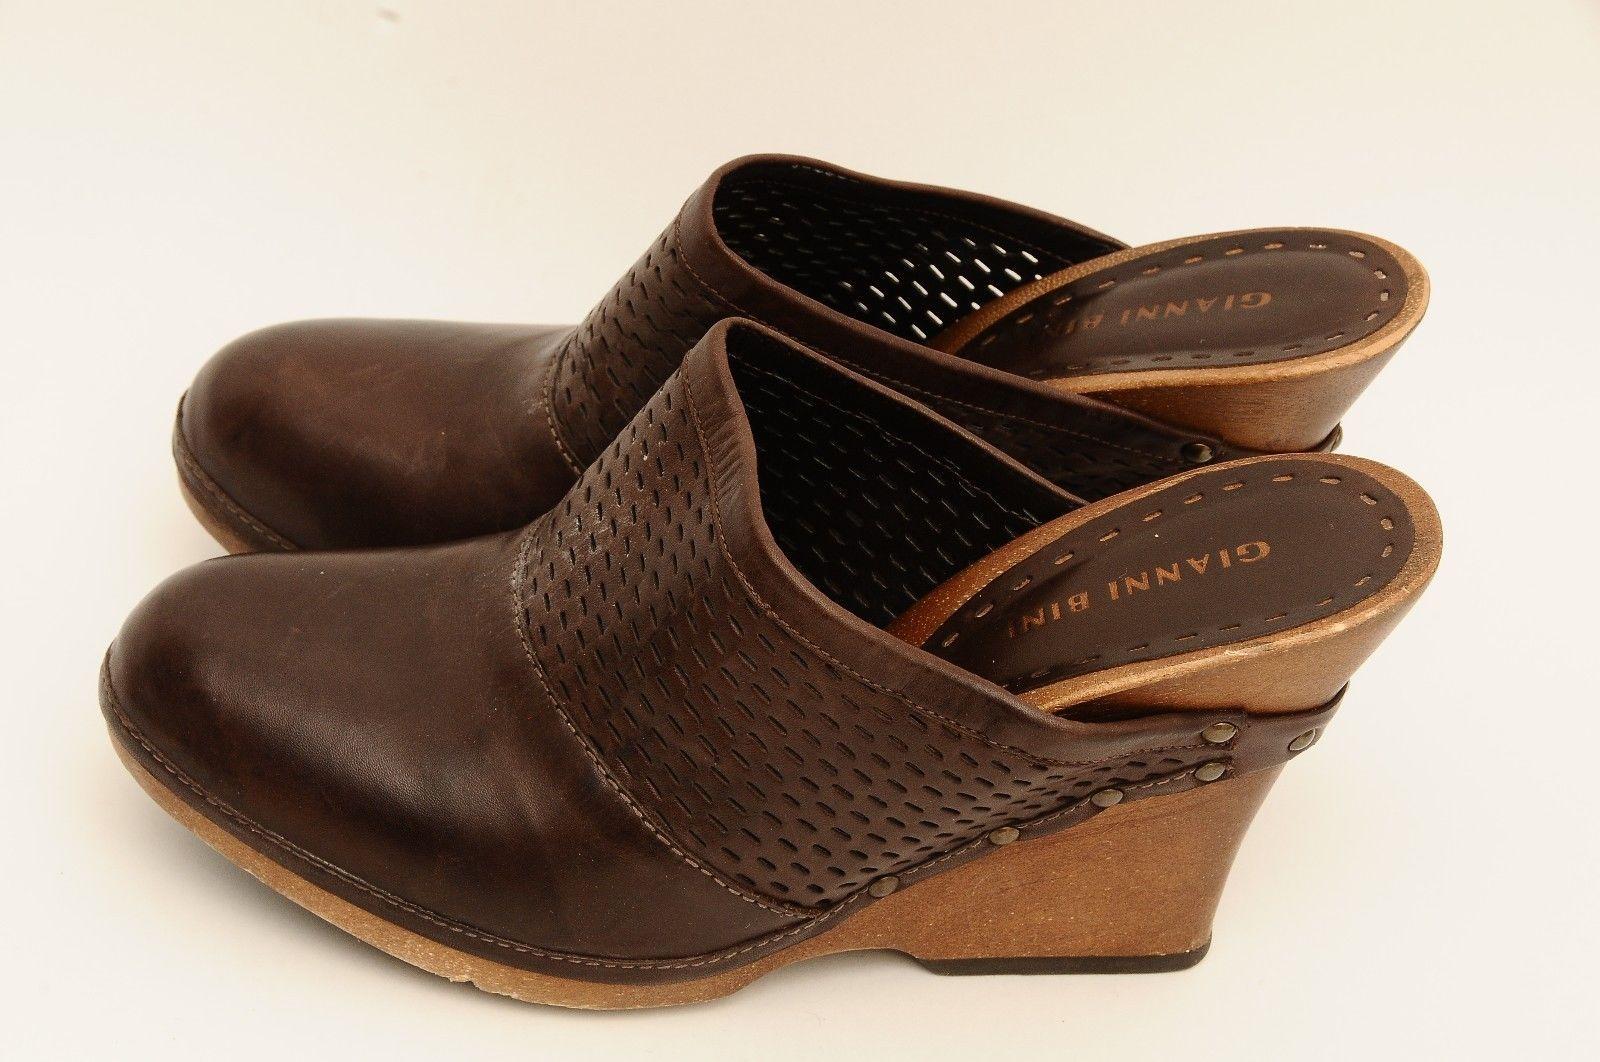 gianni bini brown leather slip on heel womens shoes size 9